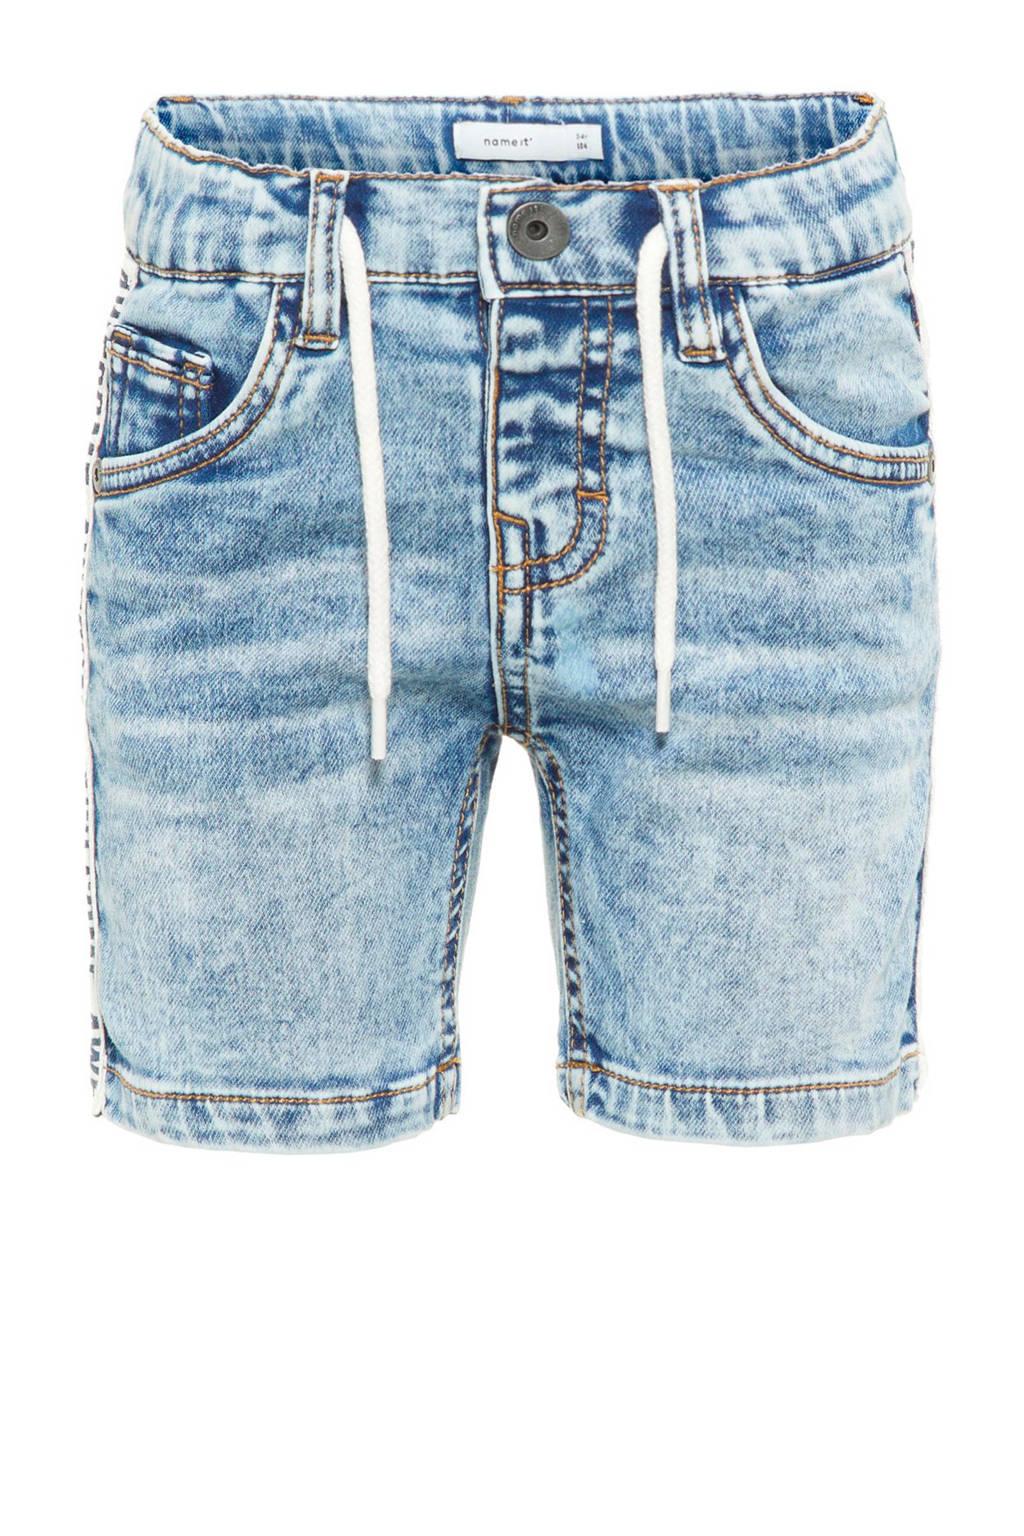 name it slim fit jeans bermuda Sofus met zijstreep, Light stonewashed